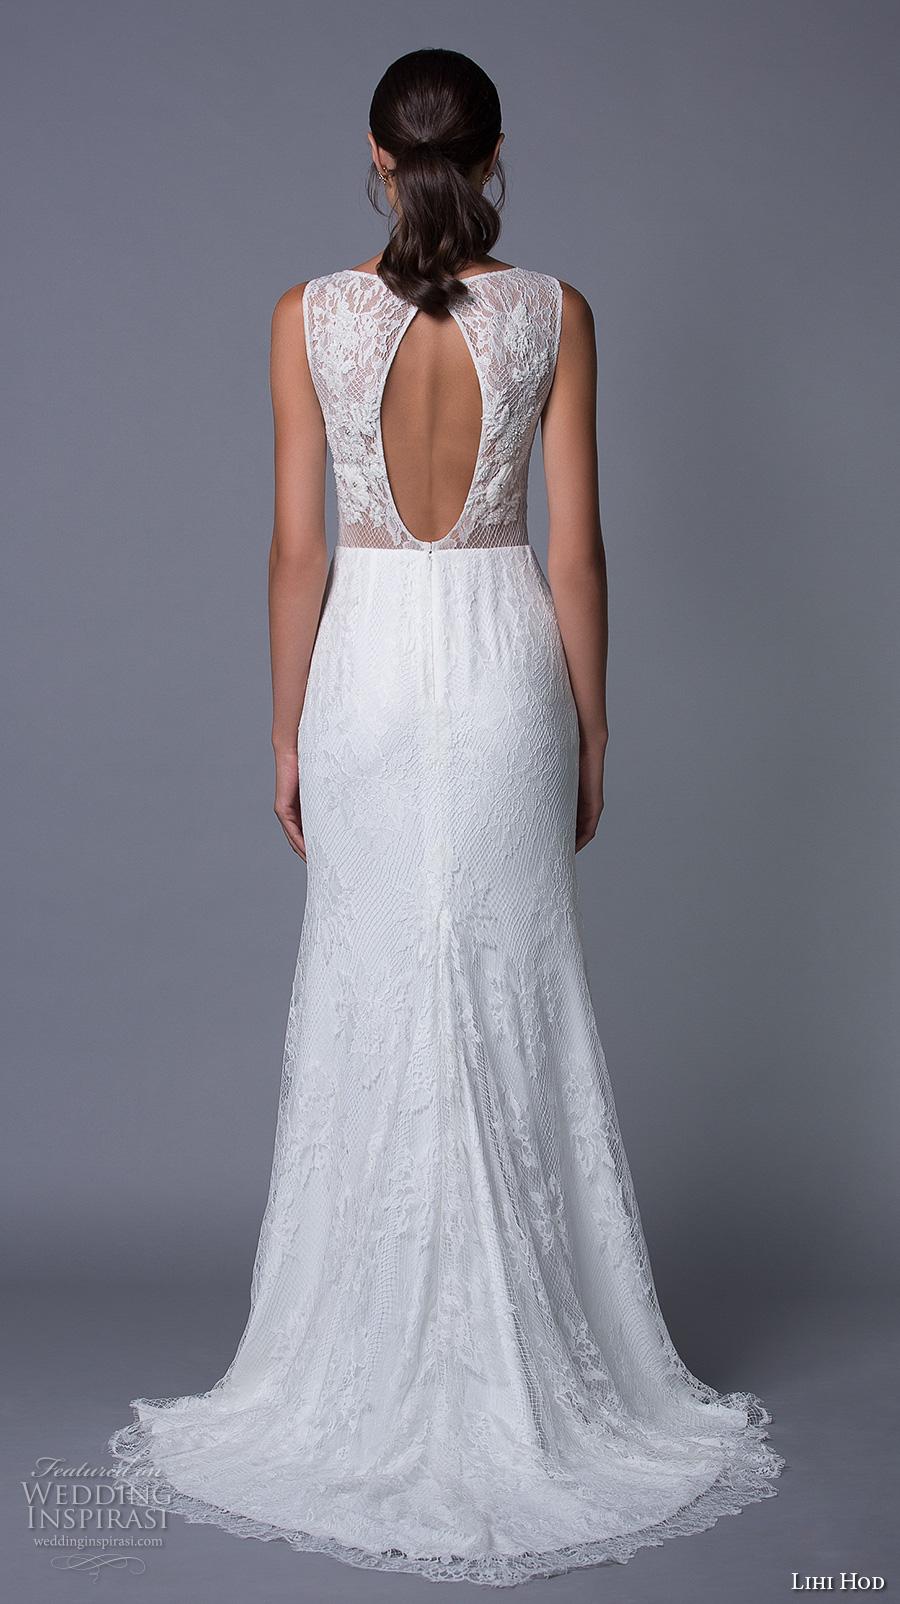 Milanoo Wedding Dresses 90 Stunning lihi hod bridal sleeveless